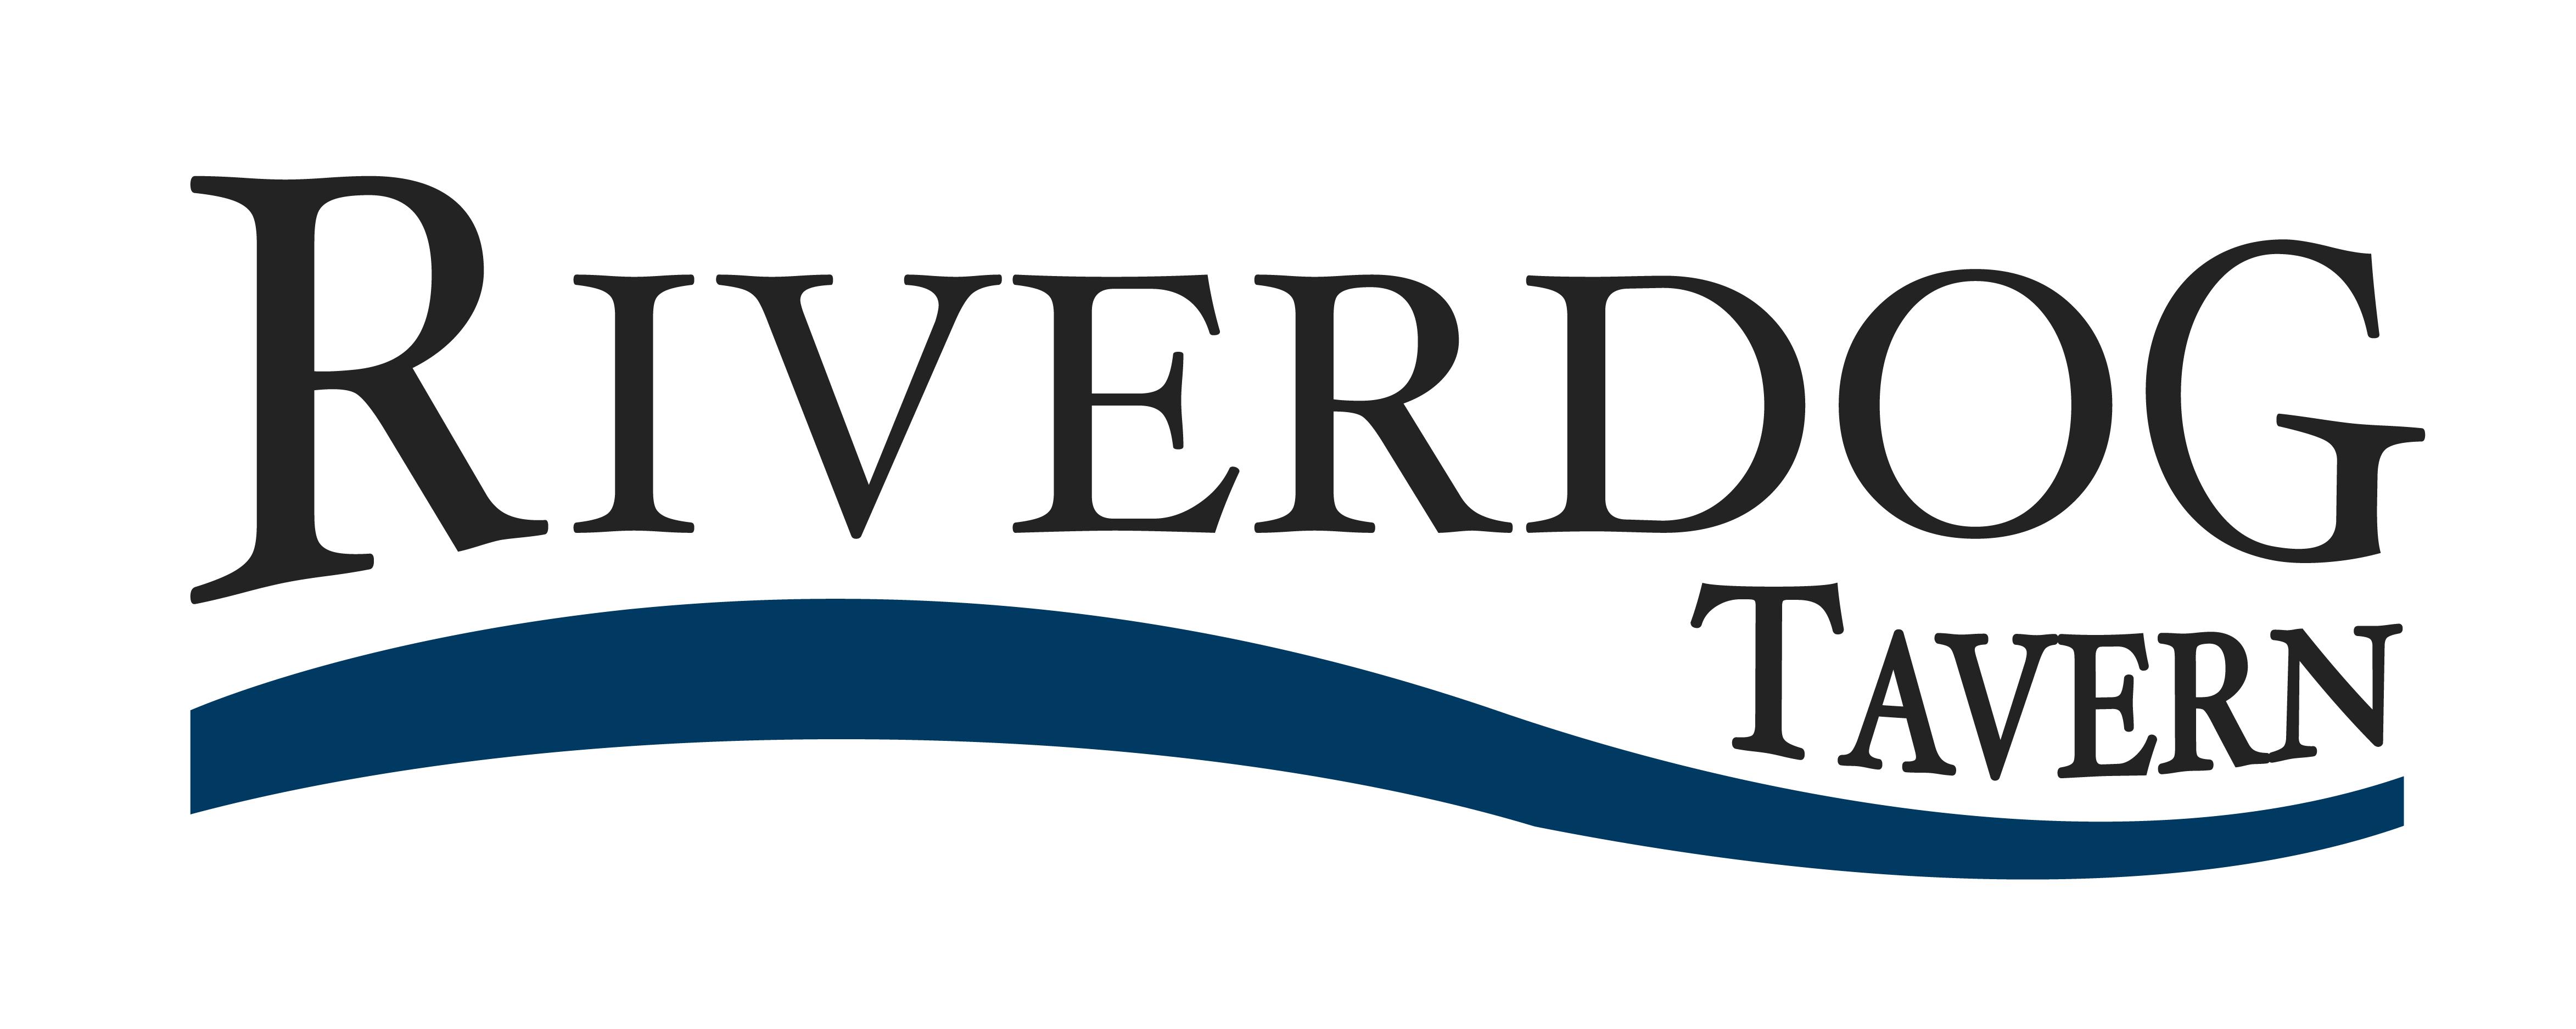 Riverdog Tavern_Logo_Tan_ Blue